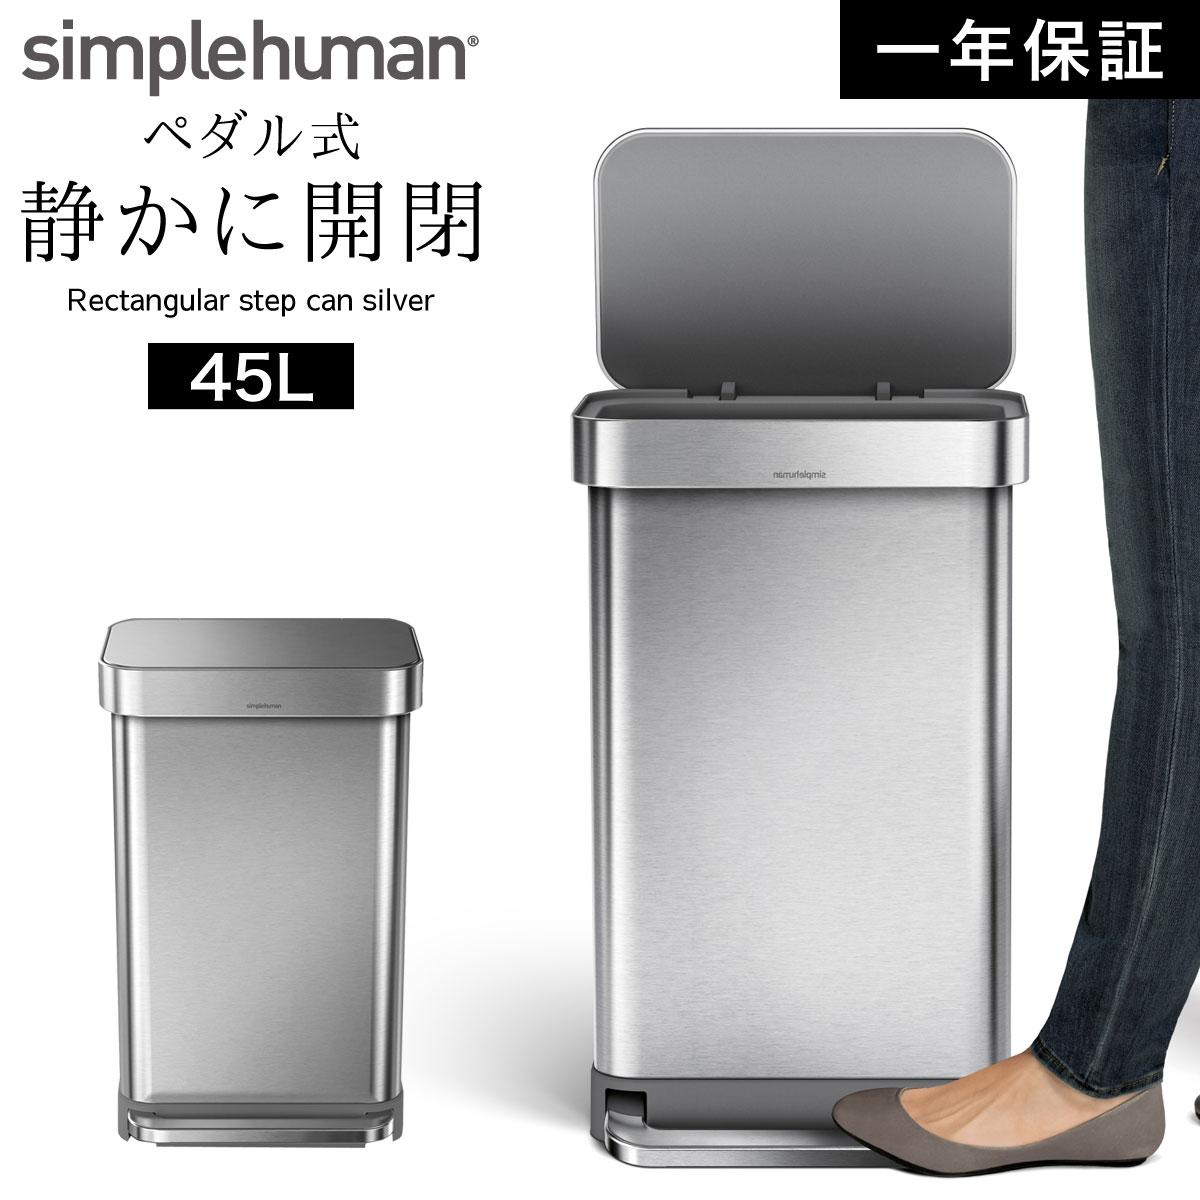 simplehuman シンプルヒューマン レクタンギュラーステップカン シルバー 45L 00113